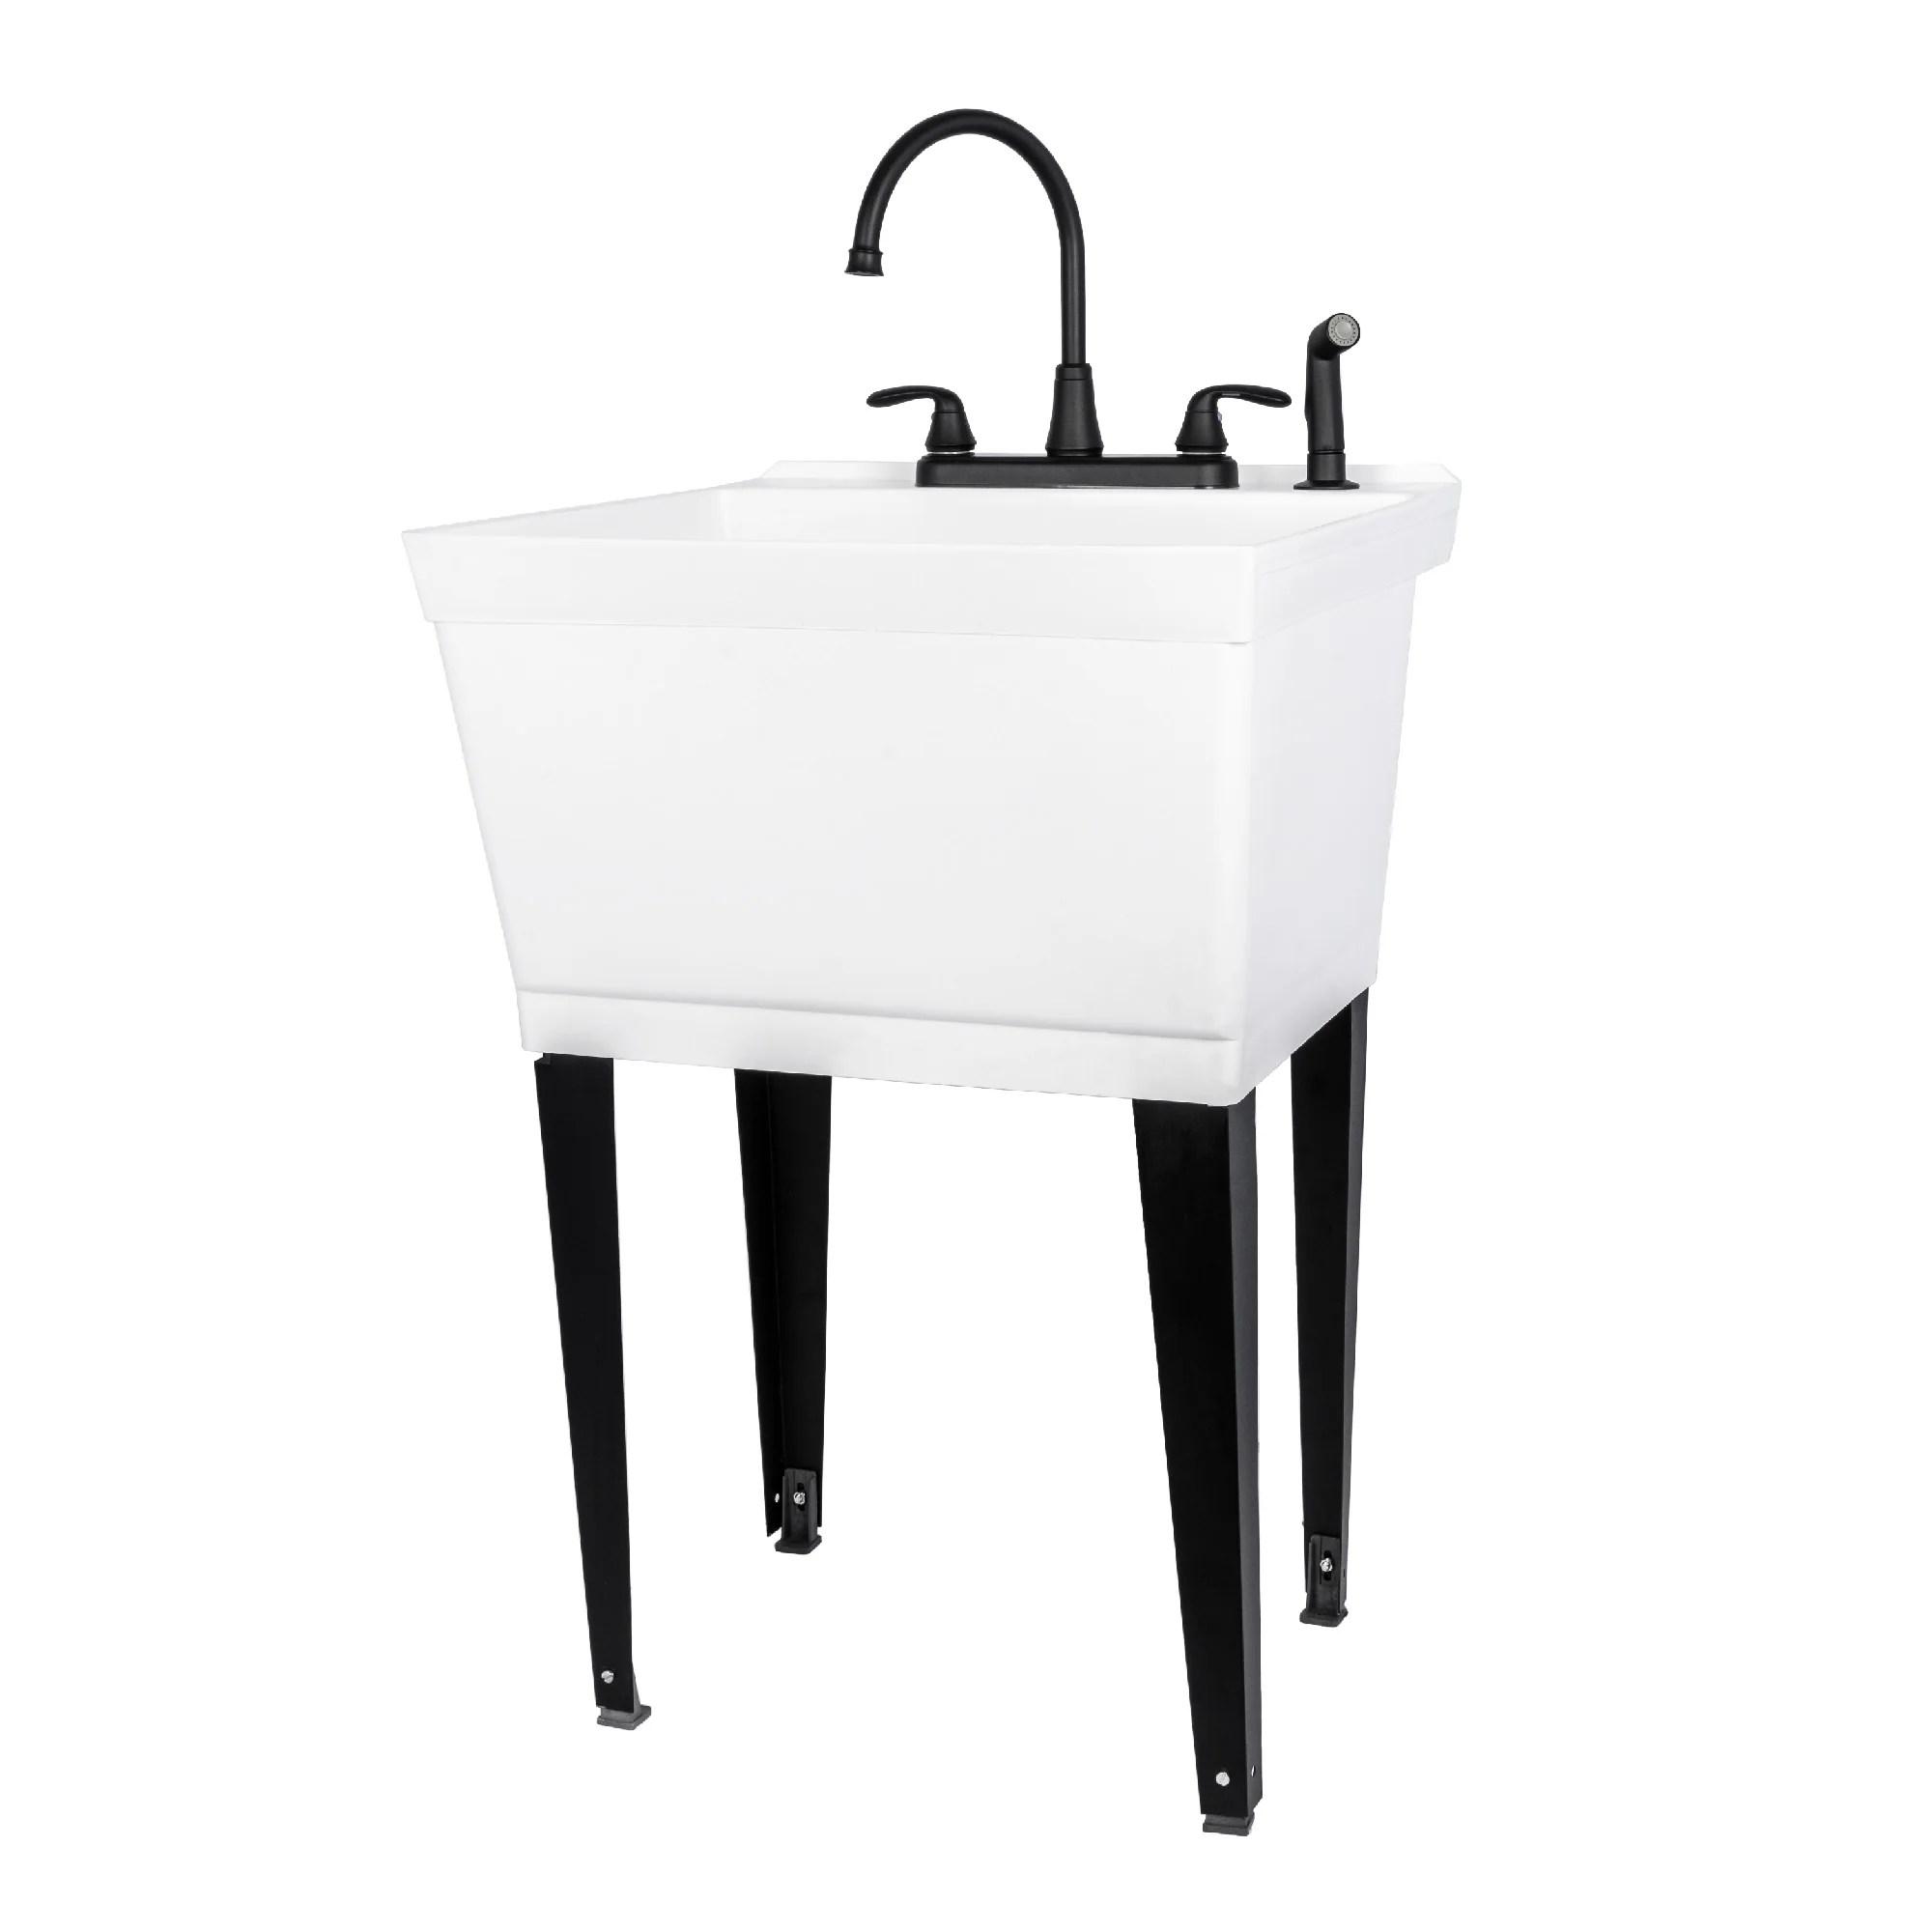 tehila utility sink with black faucet side sprayer 19 gallon white